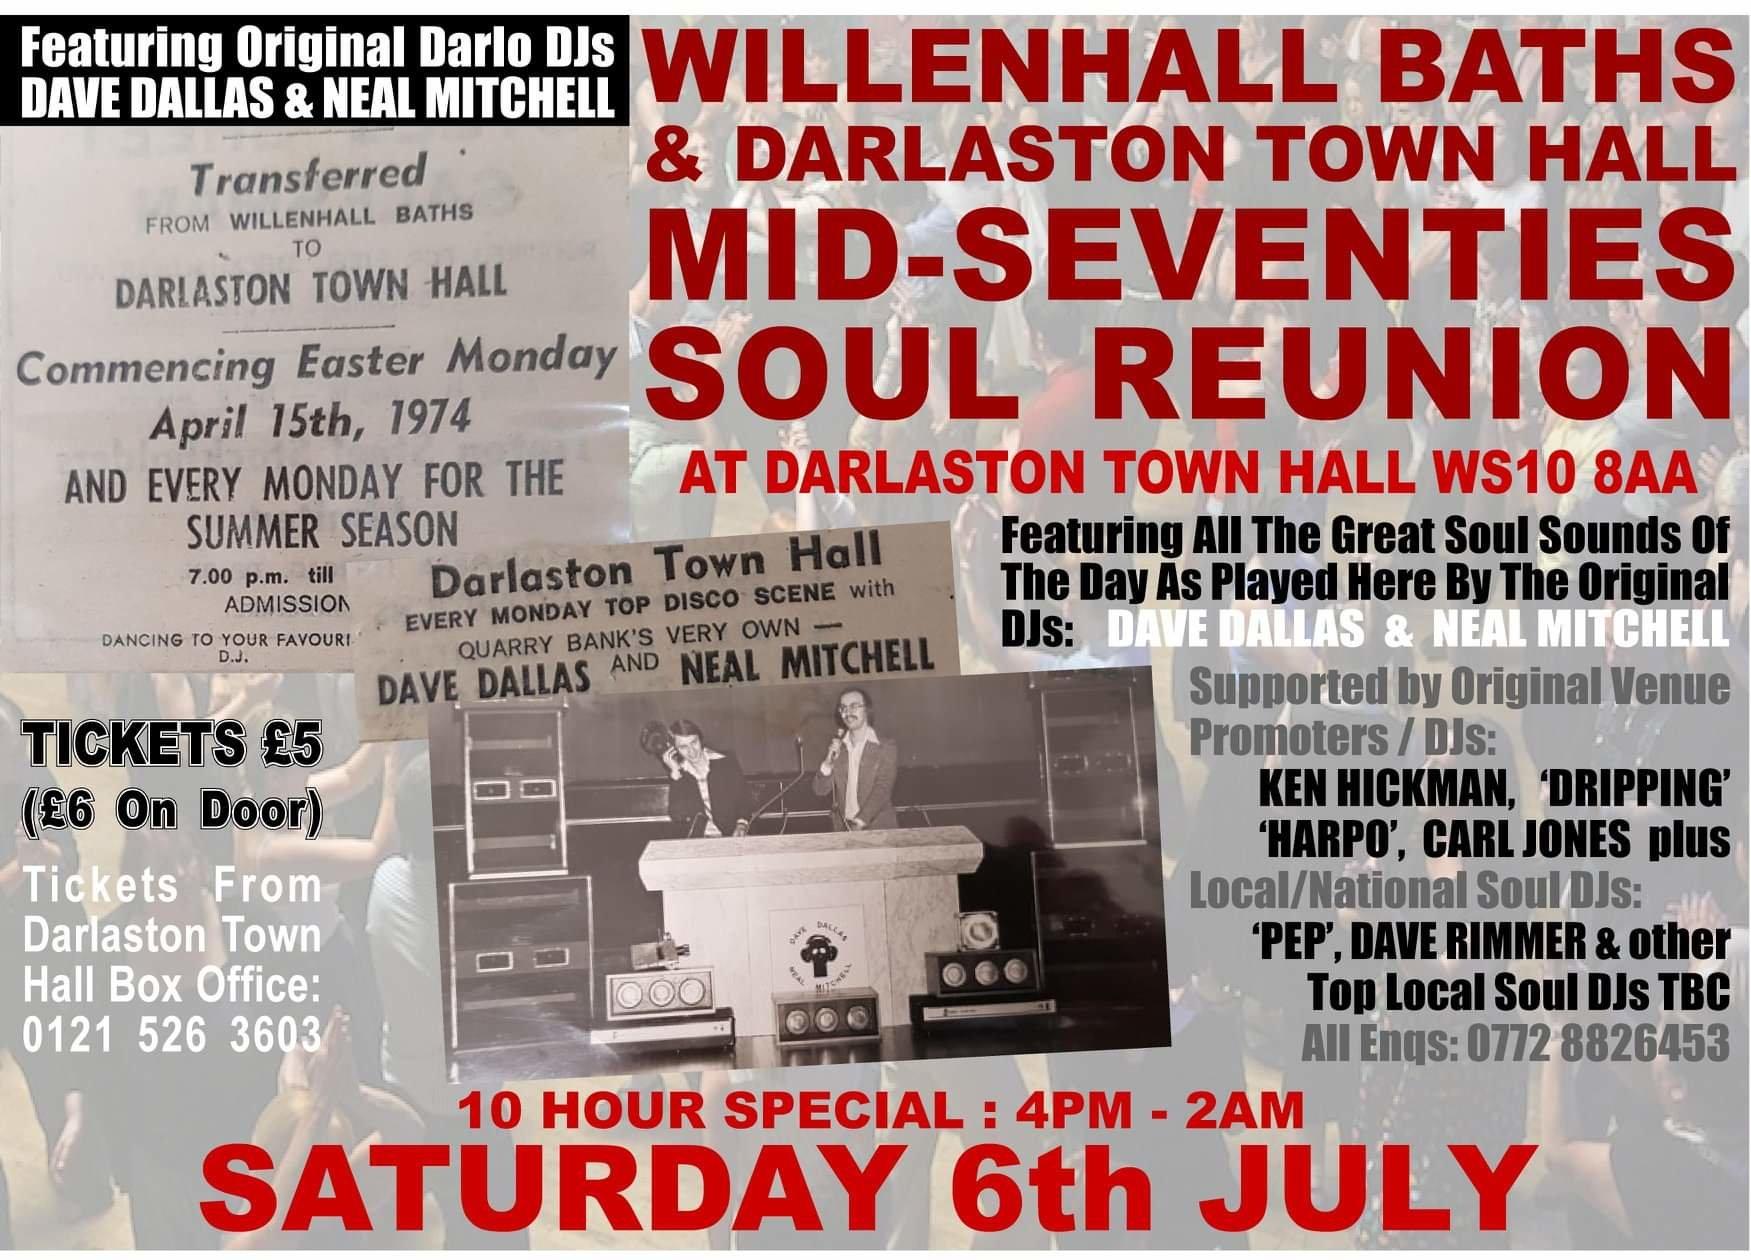 Willenhall Baths  Darlo Town Hall Reunion flyer